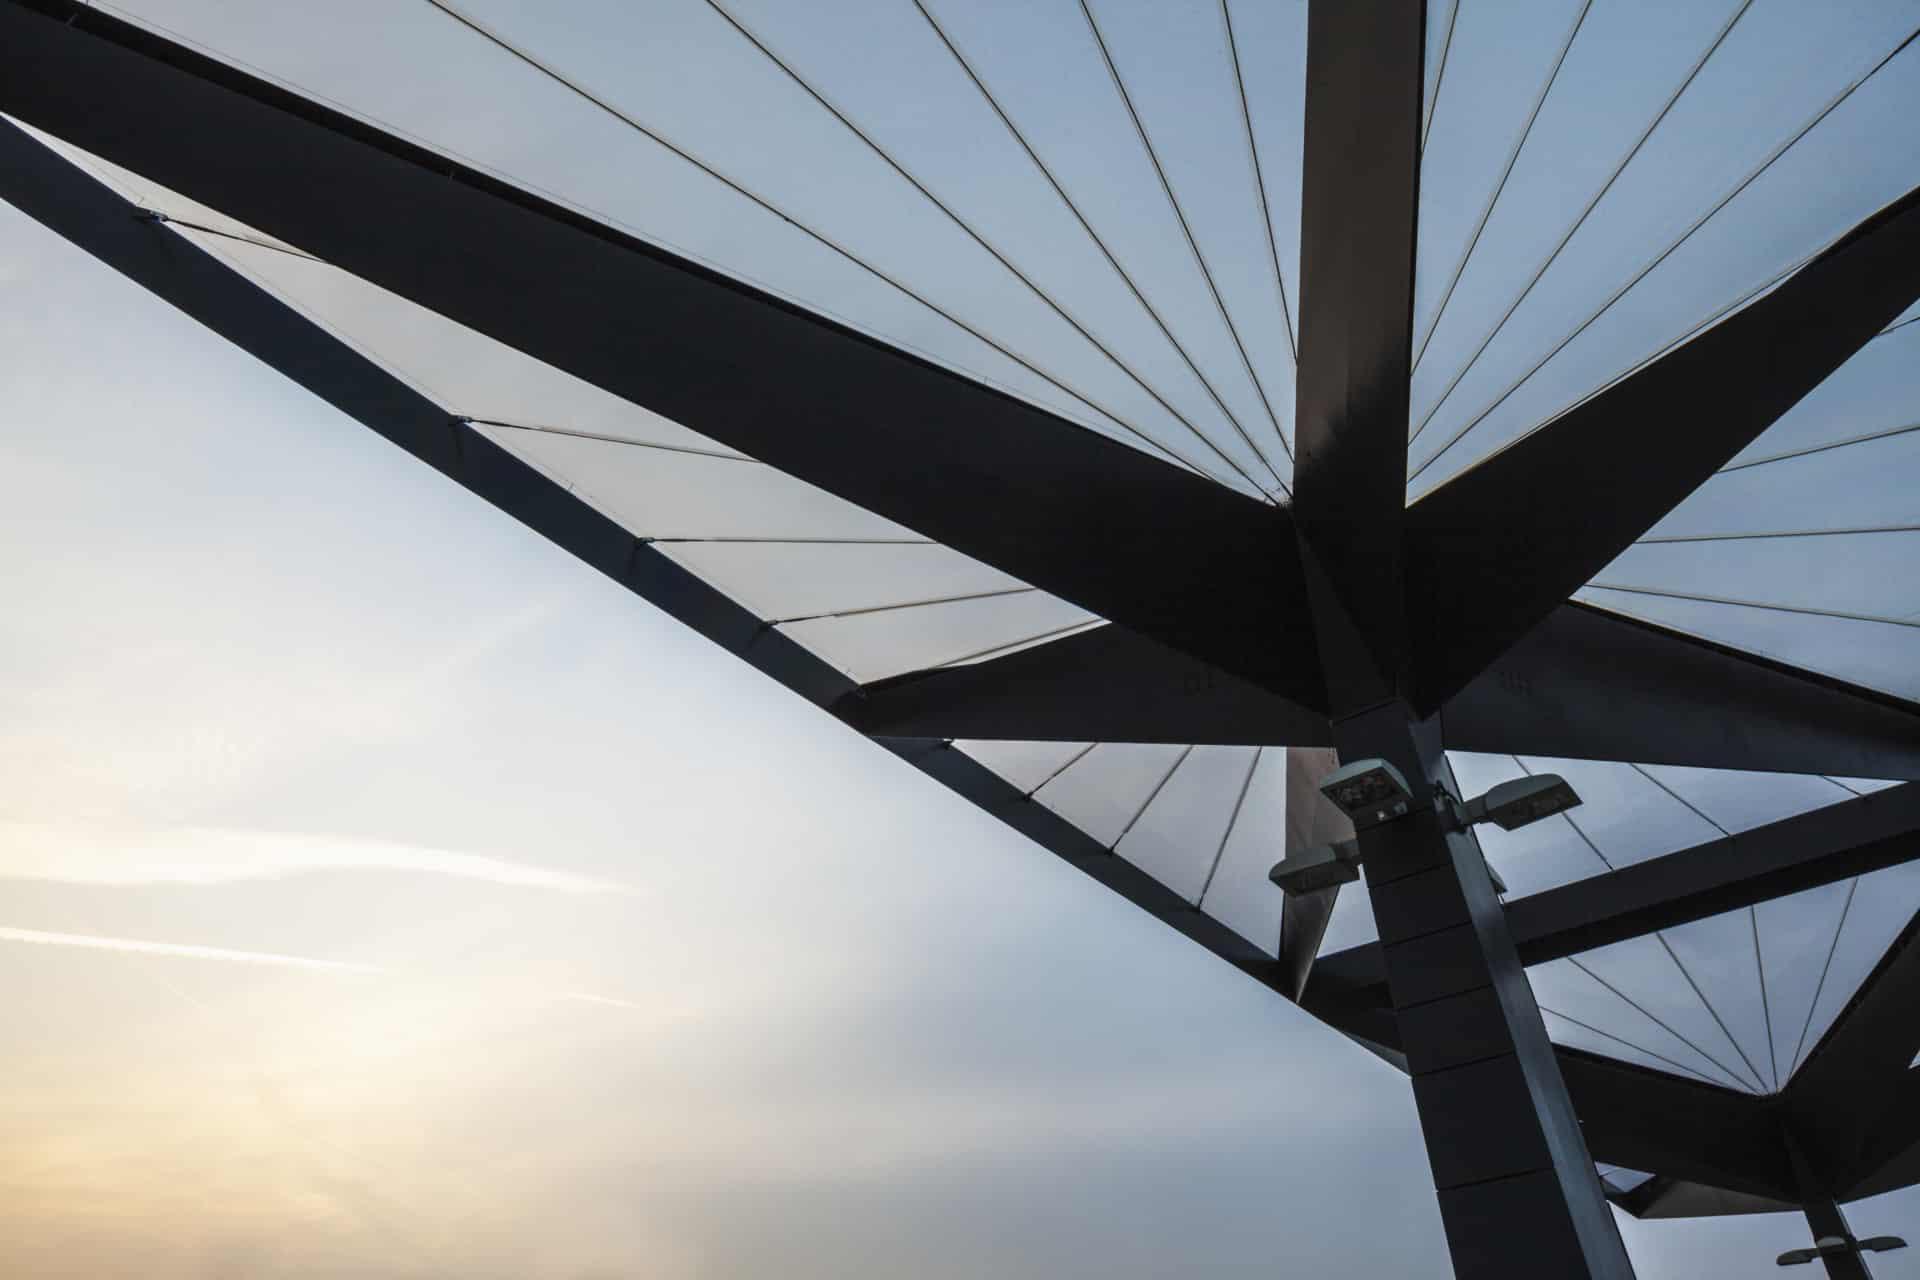 Vector Foiltec installierte sechs Texlon® ETFE-Überdachungen am Busbahnhof Tottenham Hale